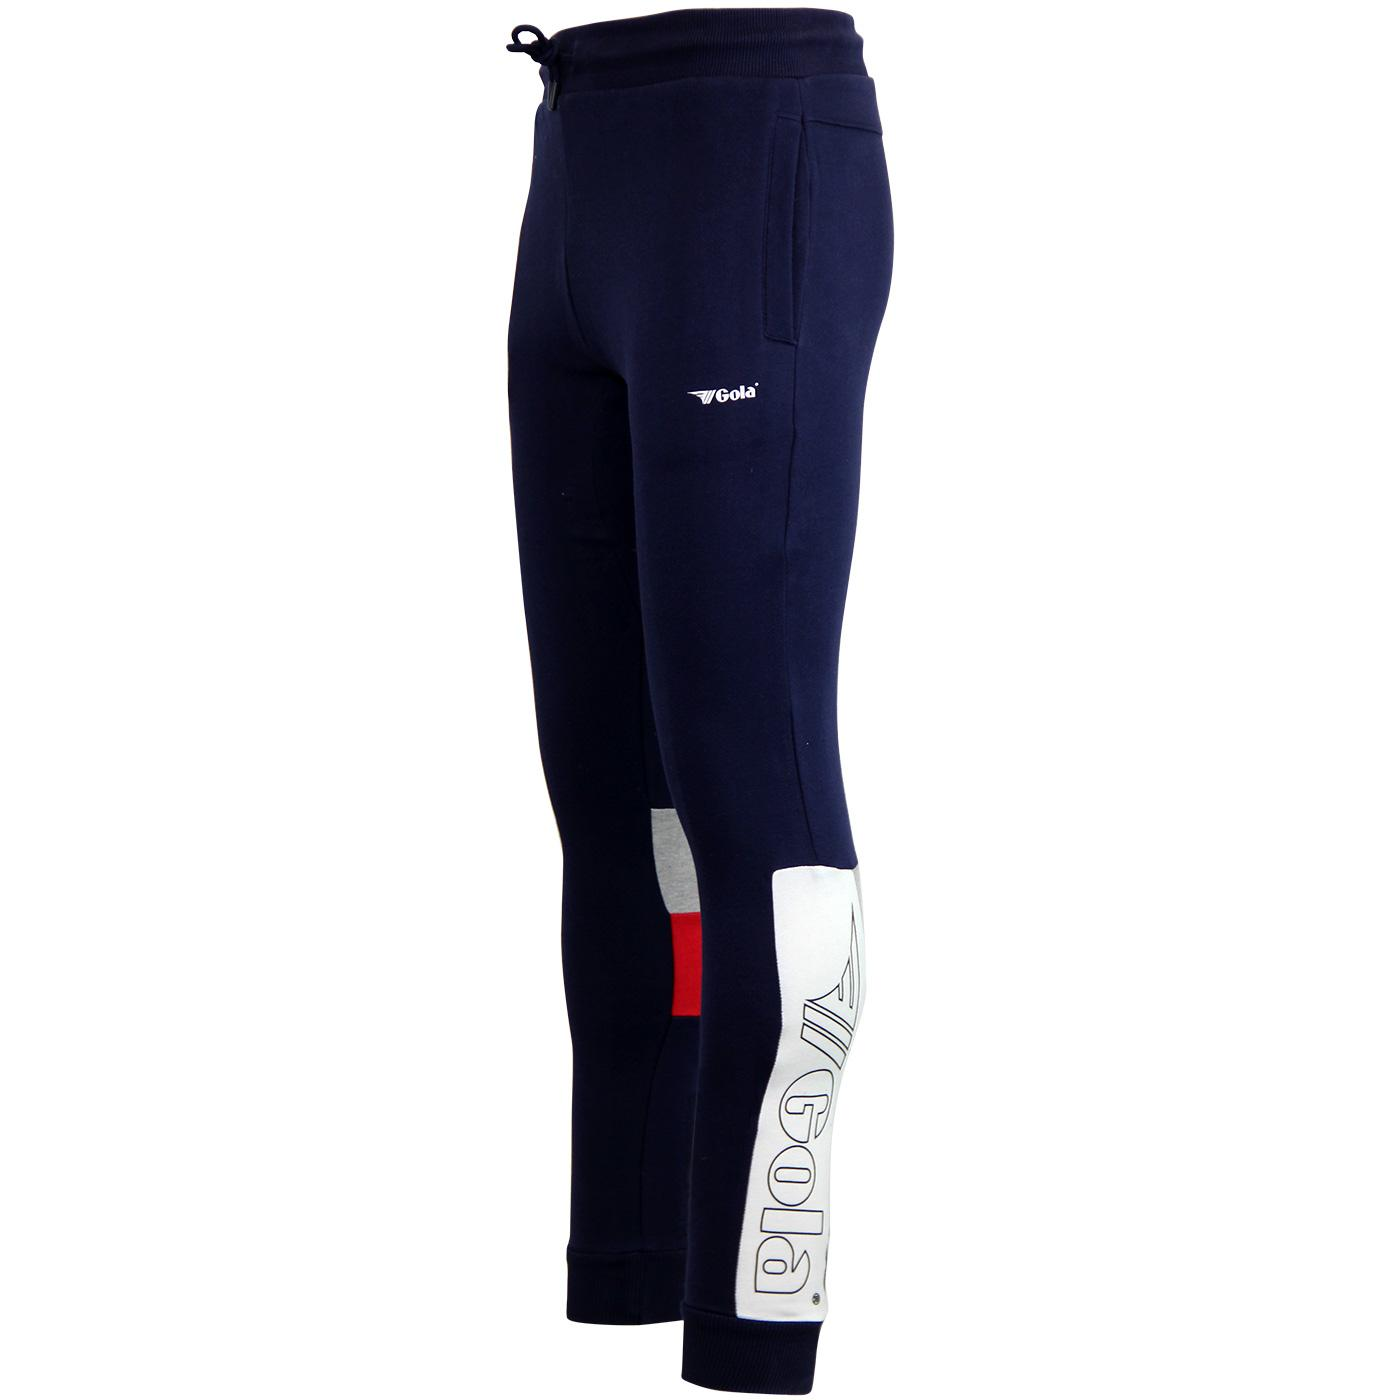 Sadler GOLA CLASSICS Retro Panelled Track Pants